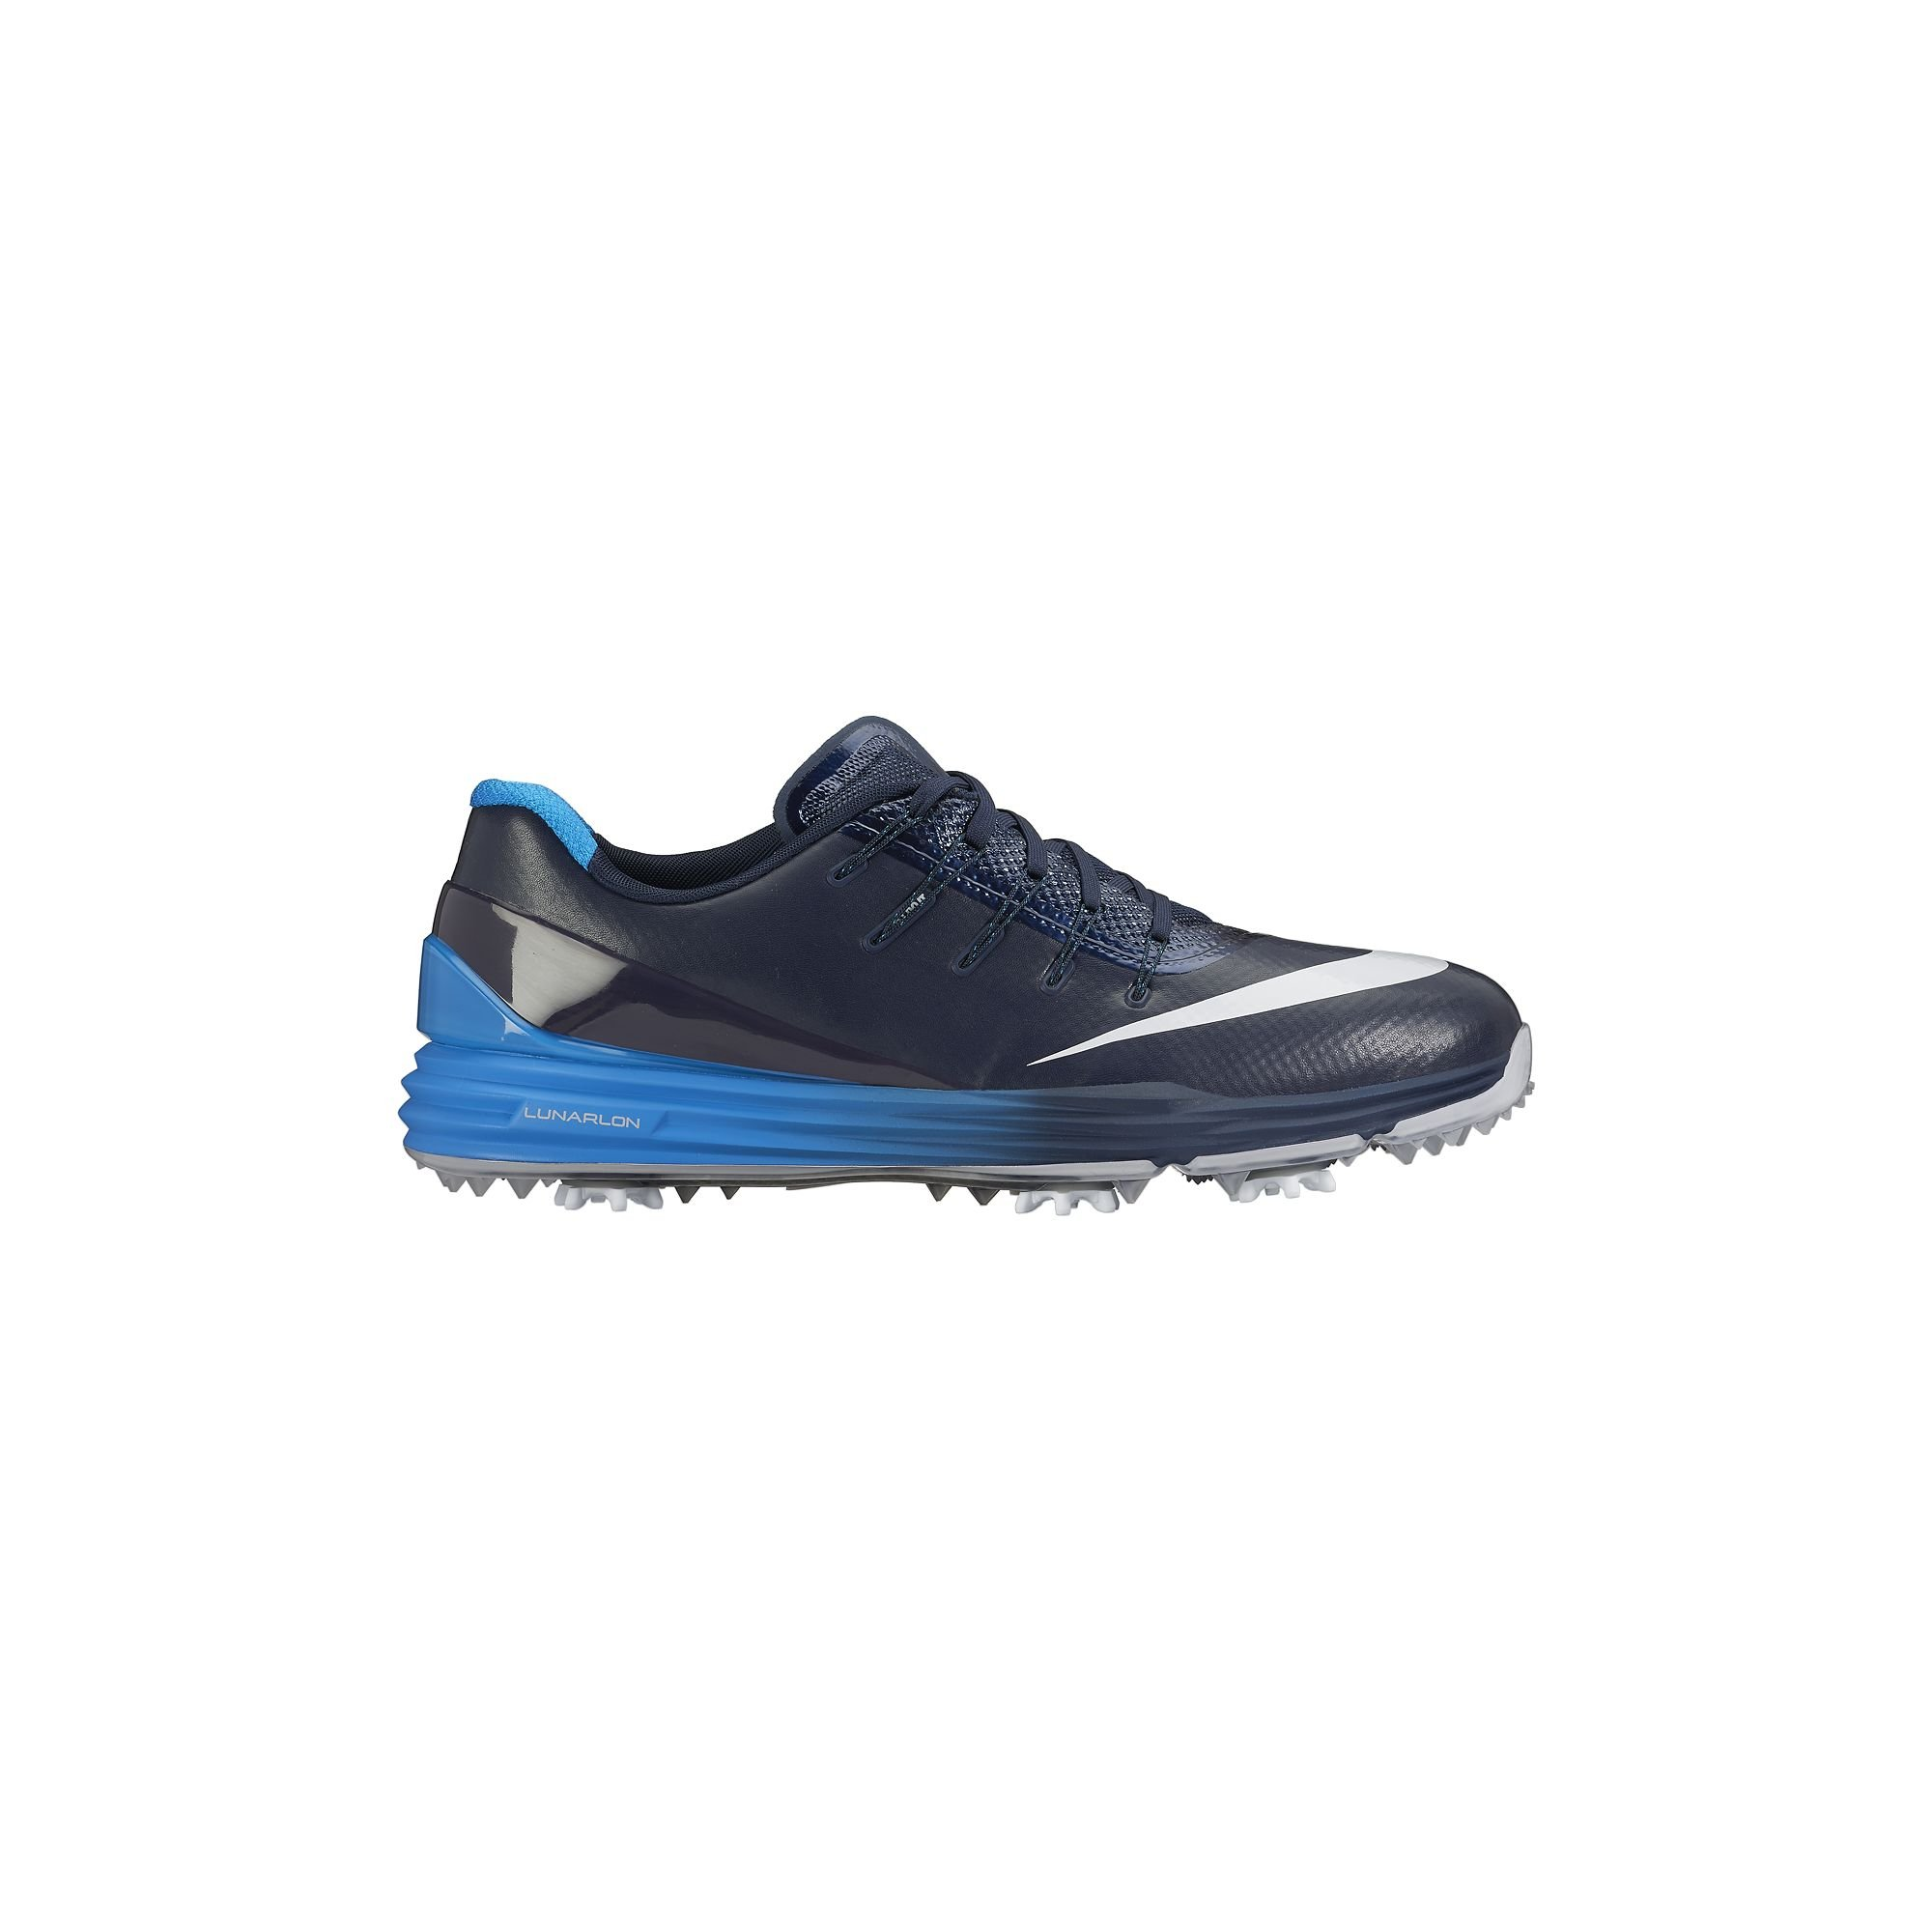 NIKE Lunar Control 4 Golf Shoes 2016 Navy/Blue/White Medium 13